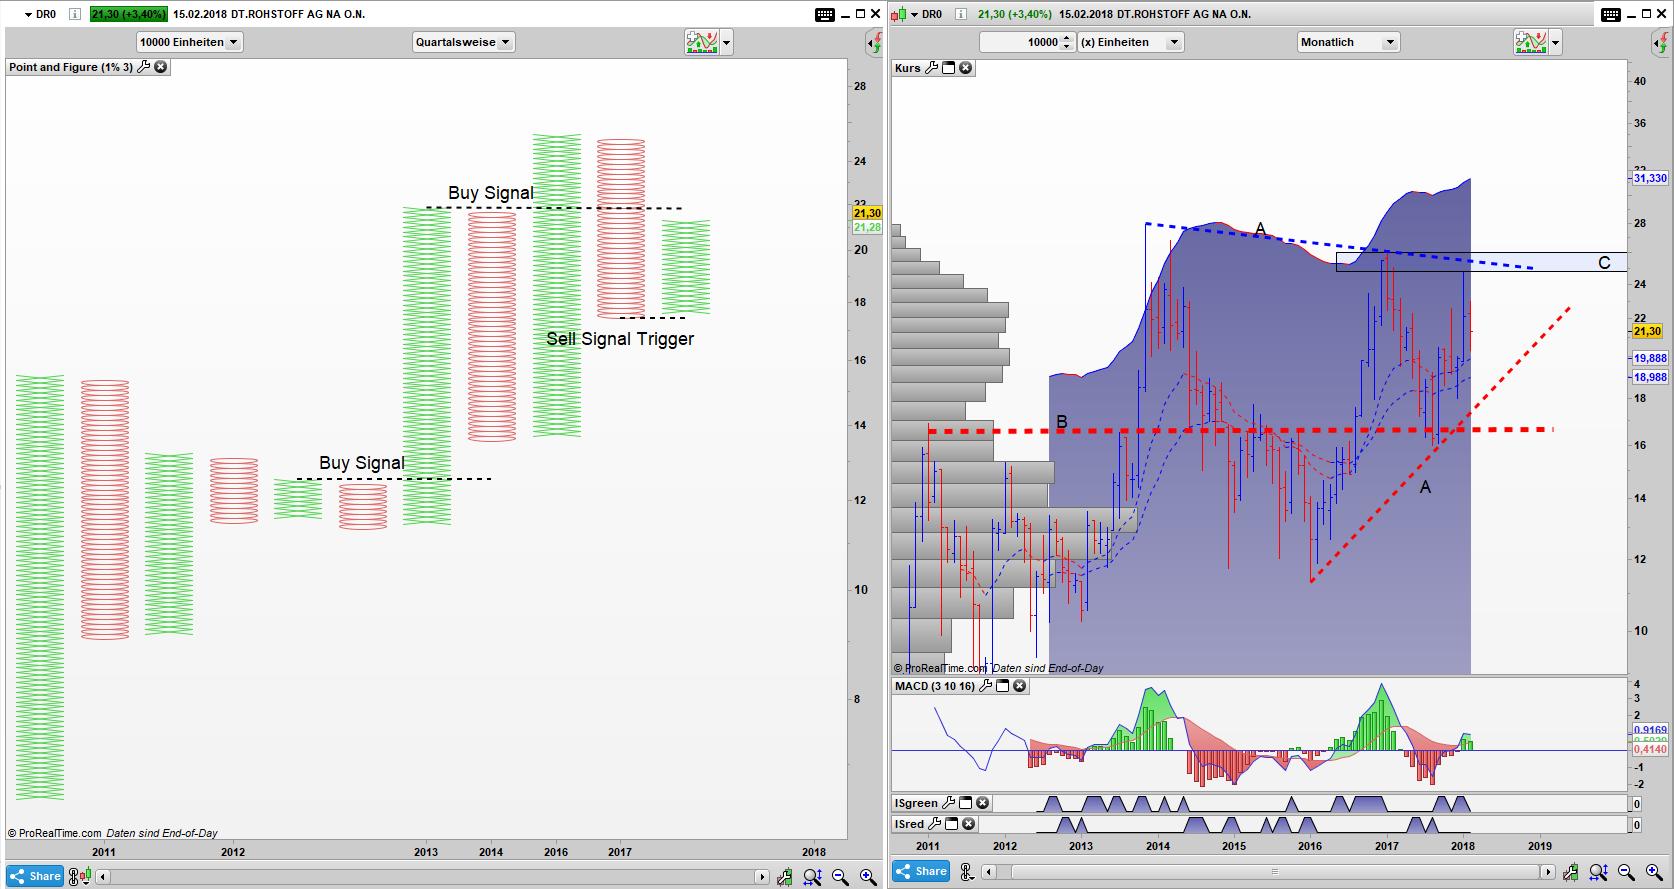 DR0 Point and Figure Quartals Chart, Bar Monats Chart: Das Kaufsignal im PaF ist noch aktiv